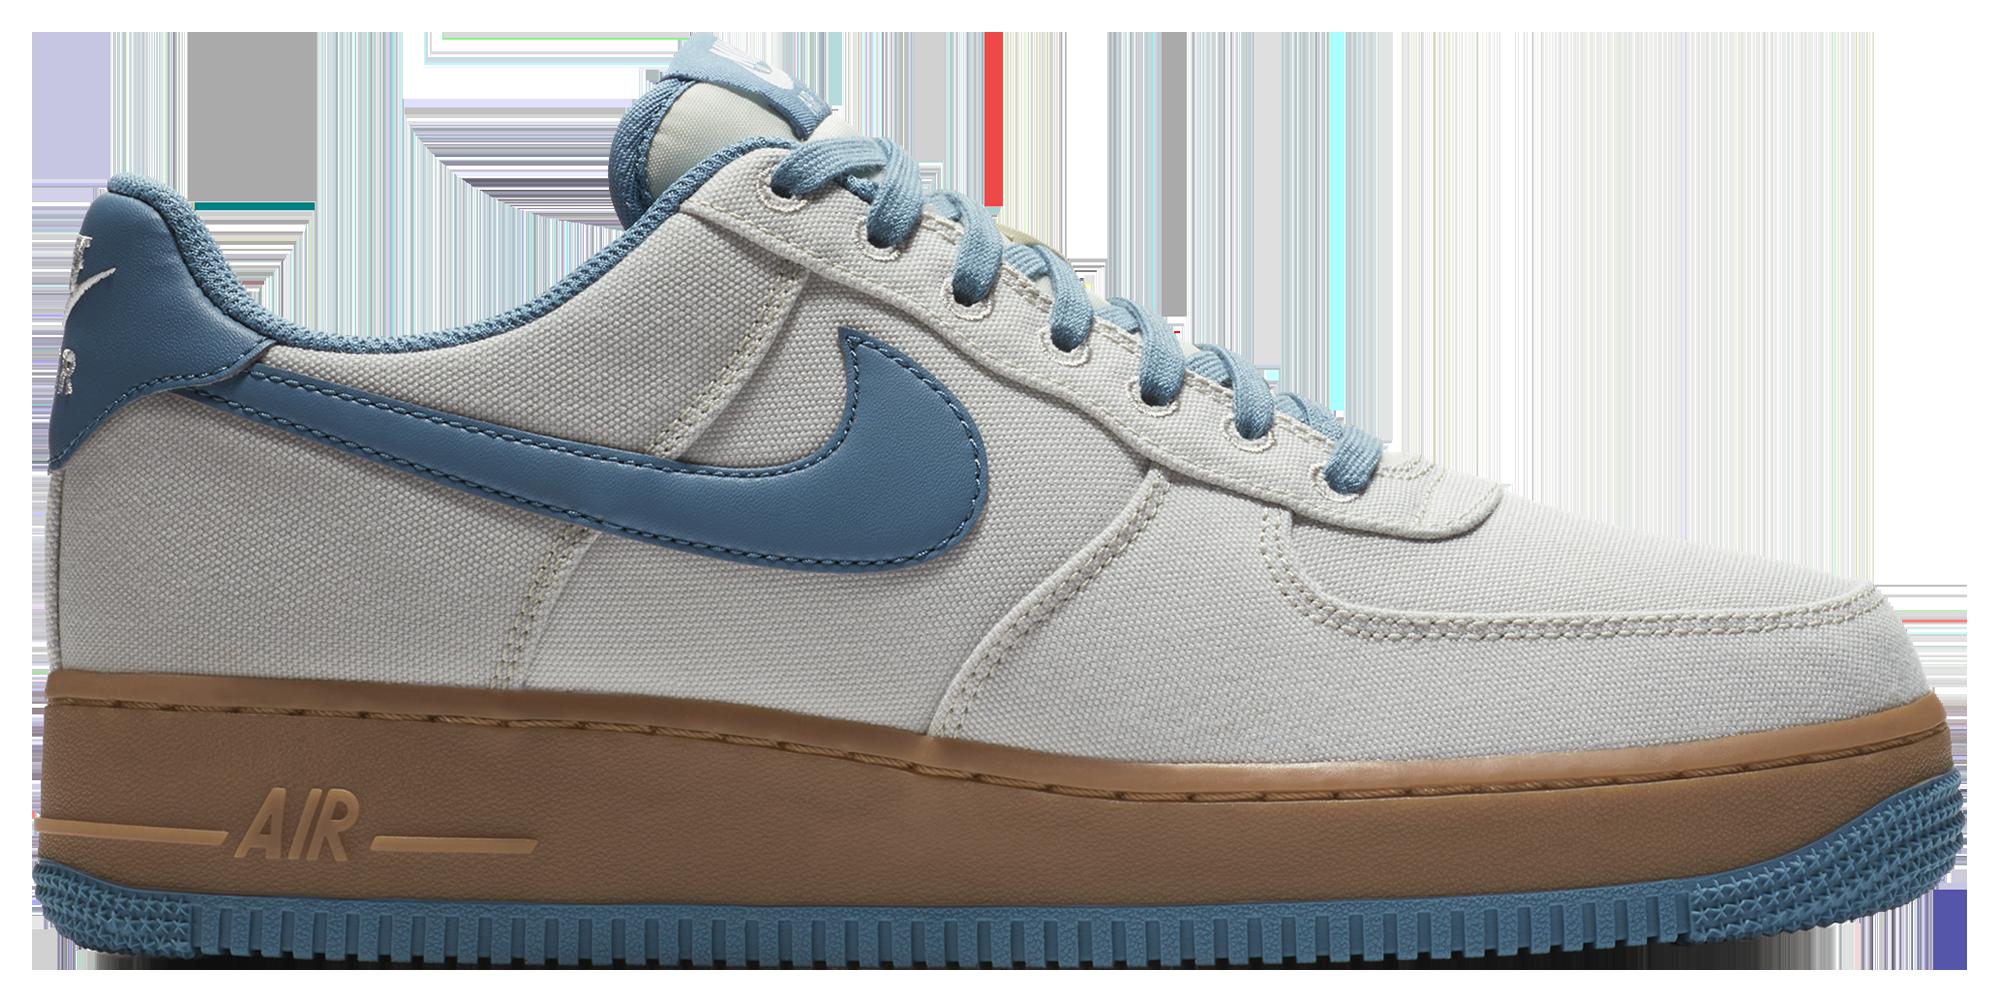 Nike Air Force 1 Low Men's Casual Shoes Bone/Blue